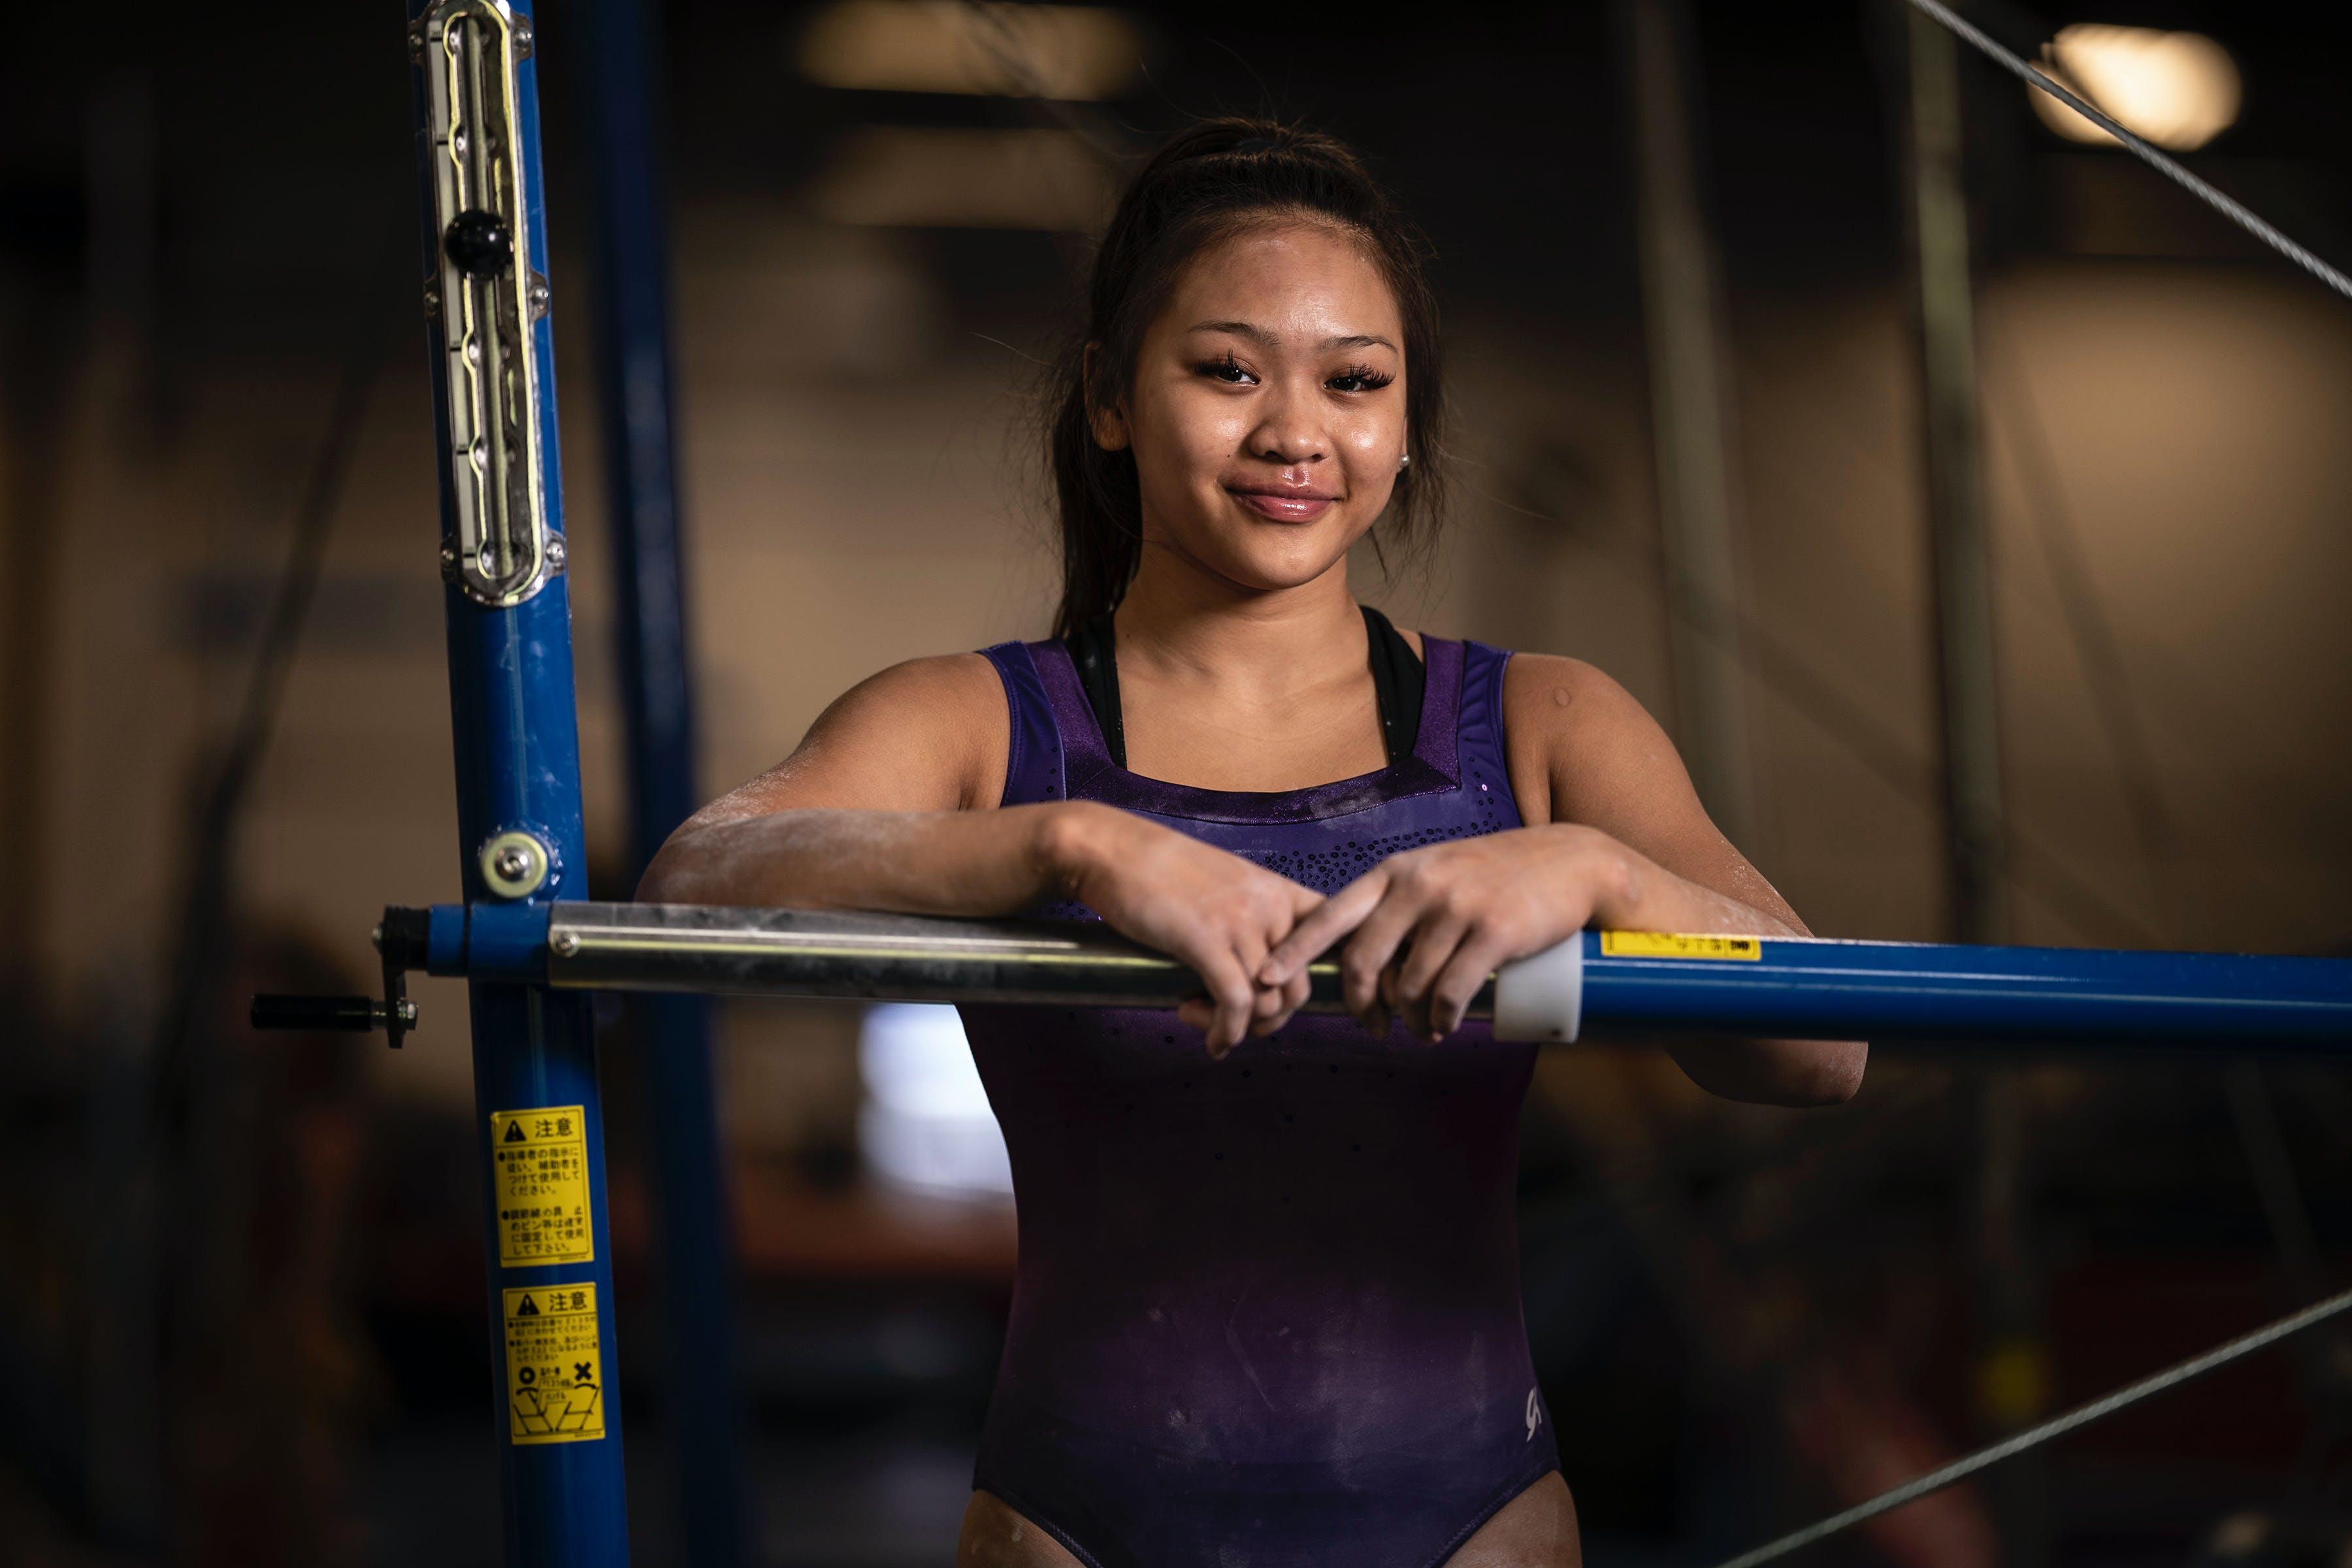 Sunisa Lee, a member U.S. women's national gymnastics team, at Midwest Gymnastics Center in Little Canada.